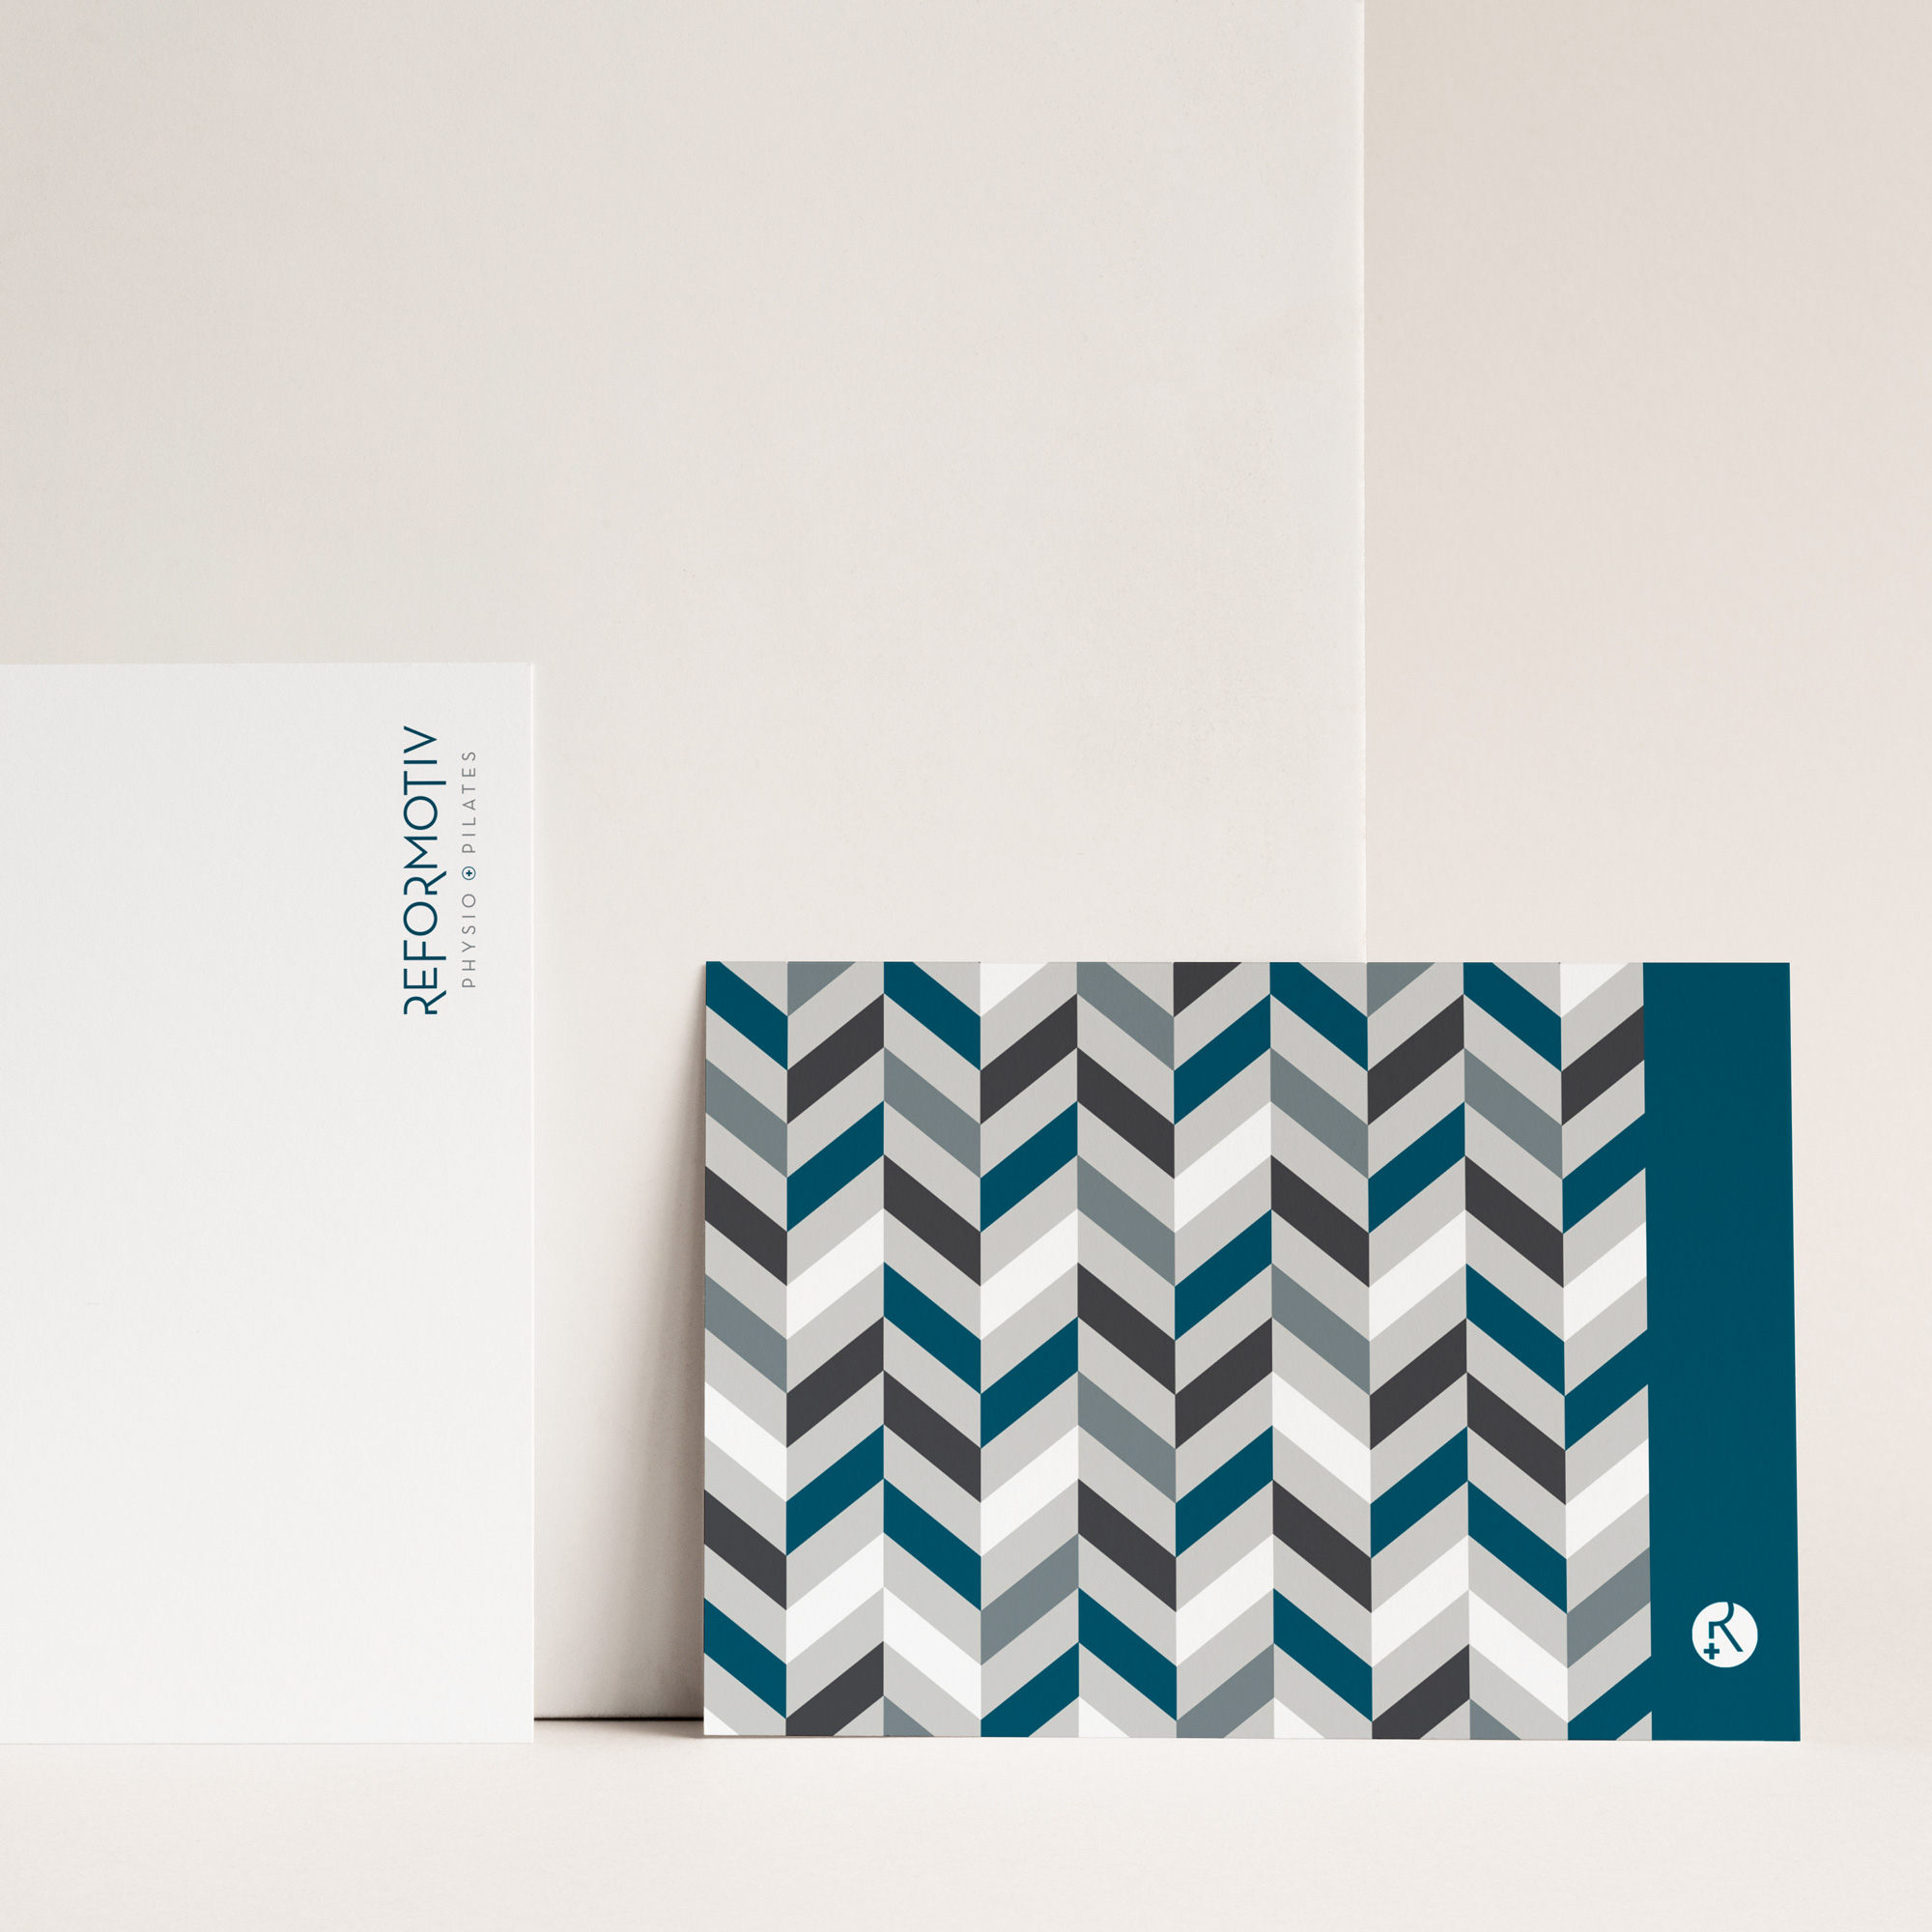 Reformotiv postcard design by Jennifer Miranda and Flipside Creative.